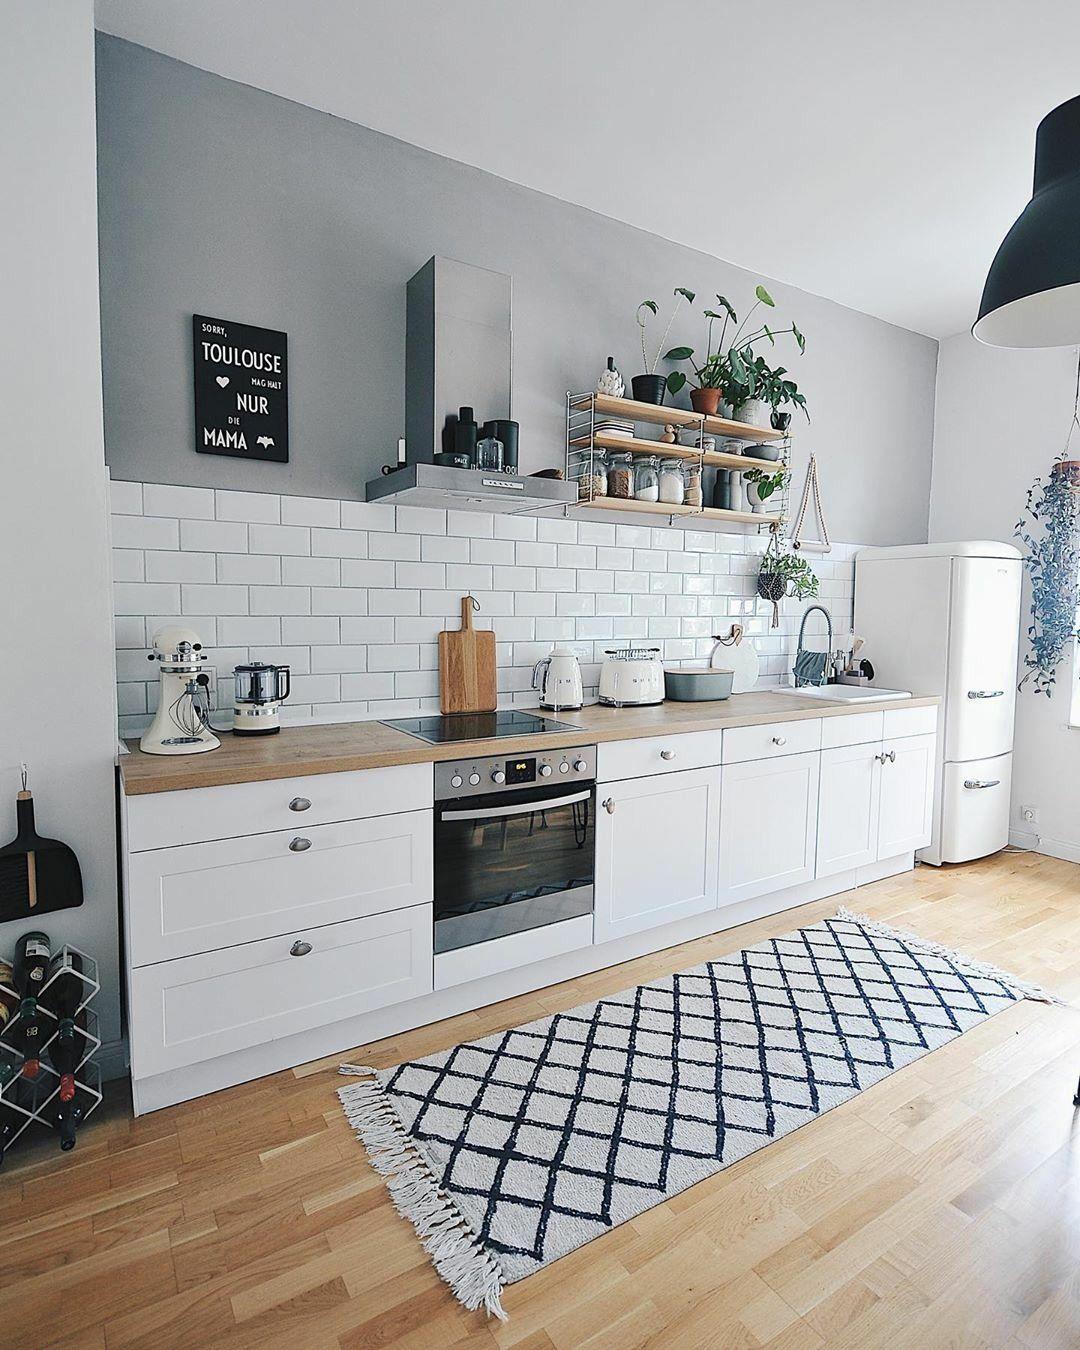 The Perfect Scandinavian Style Home En 2020 Idee Deco Cuisine Ouverte Idee Deco Cuisine Cuisine Blanche Et Bois